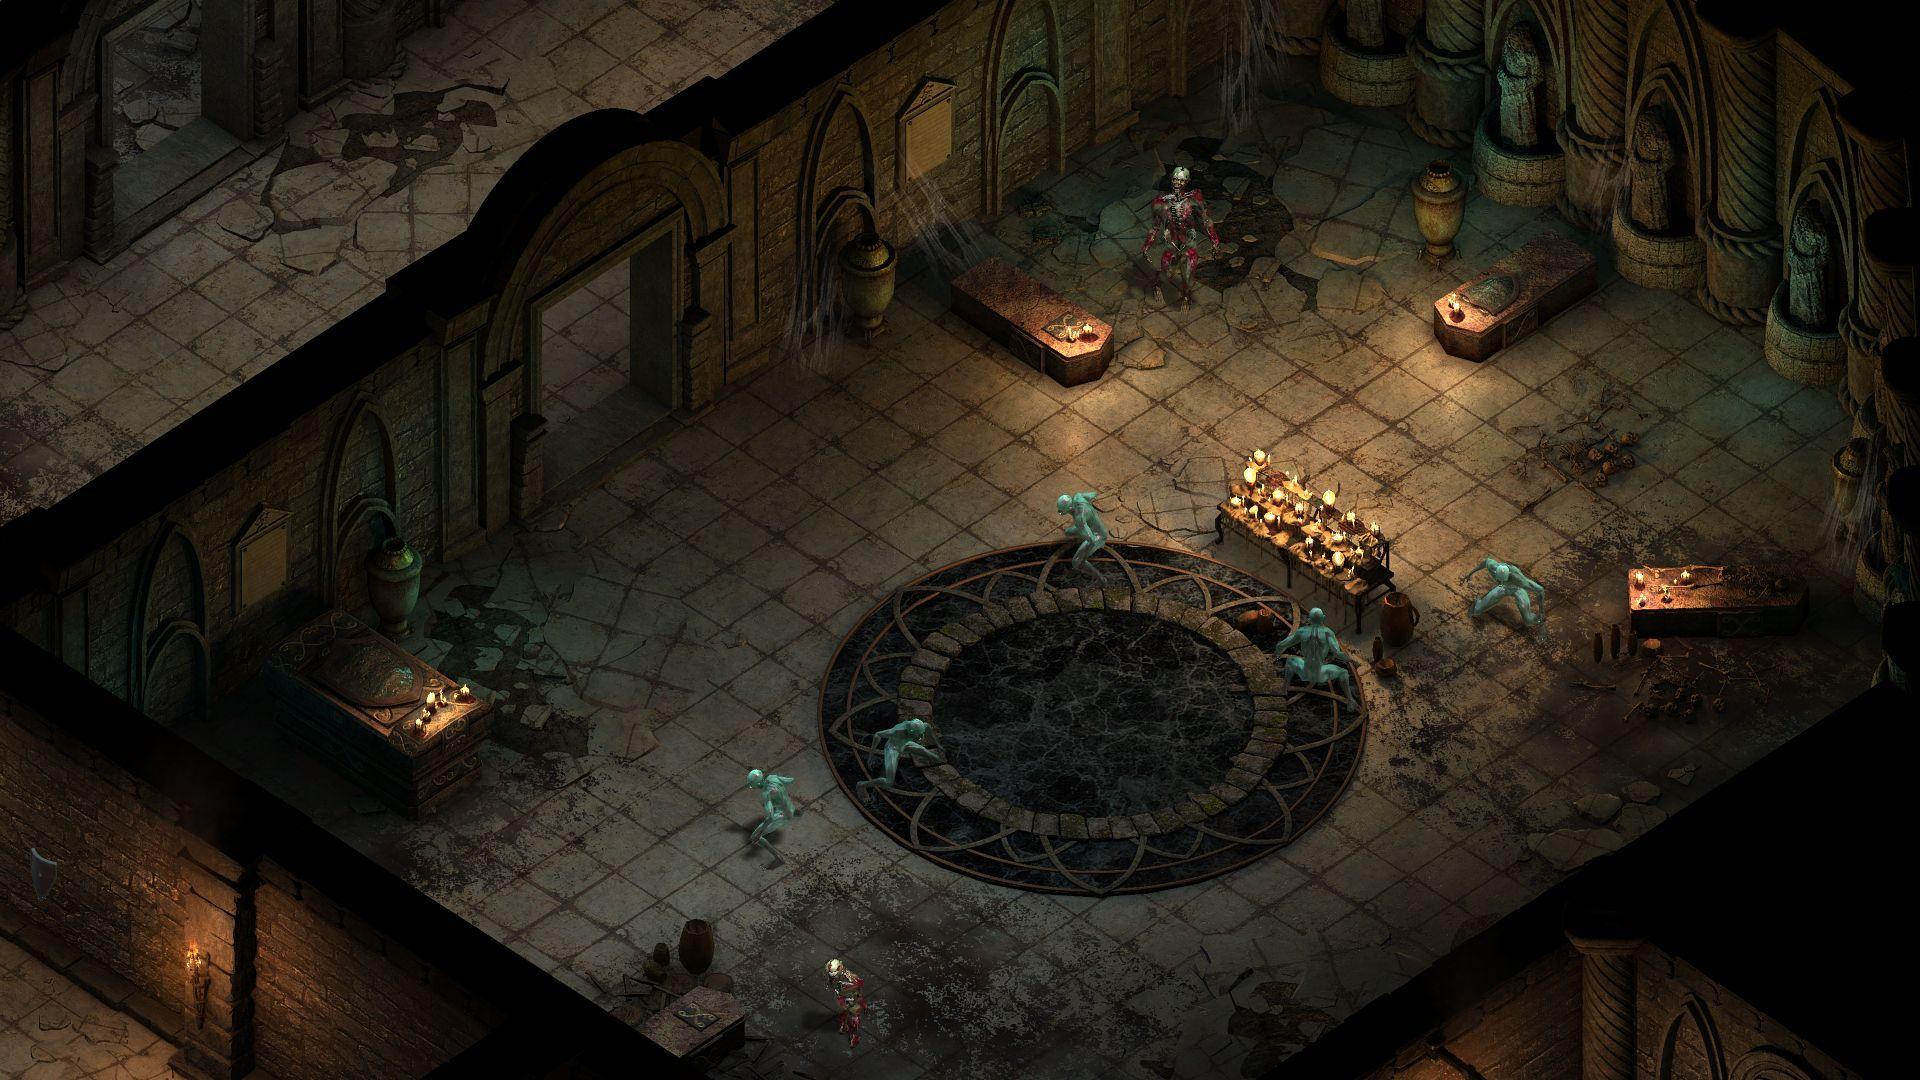 poe raedrics dungeon